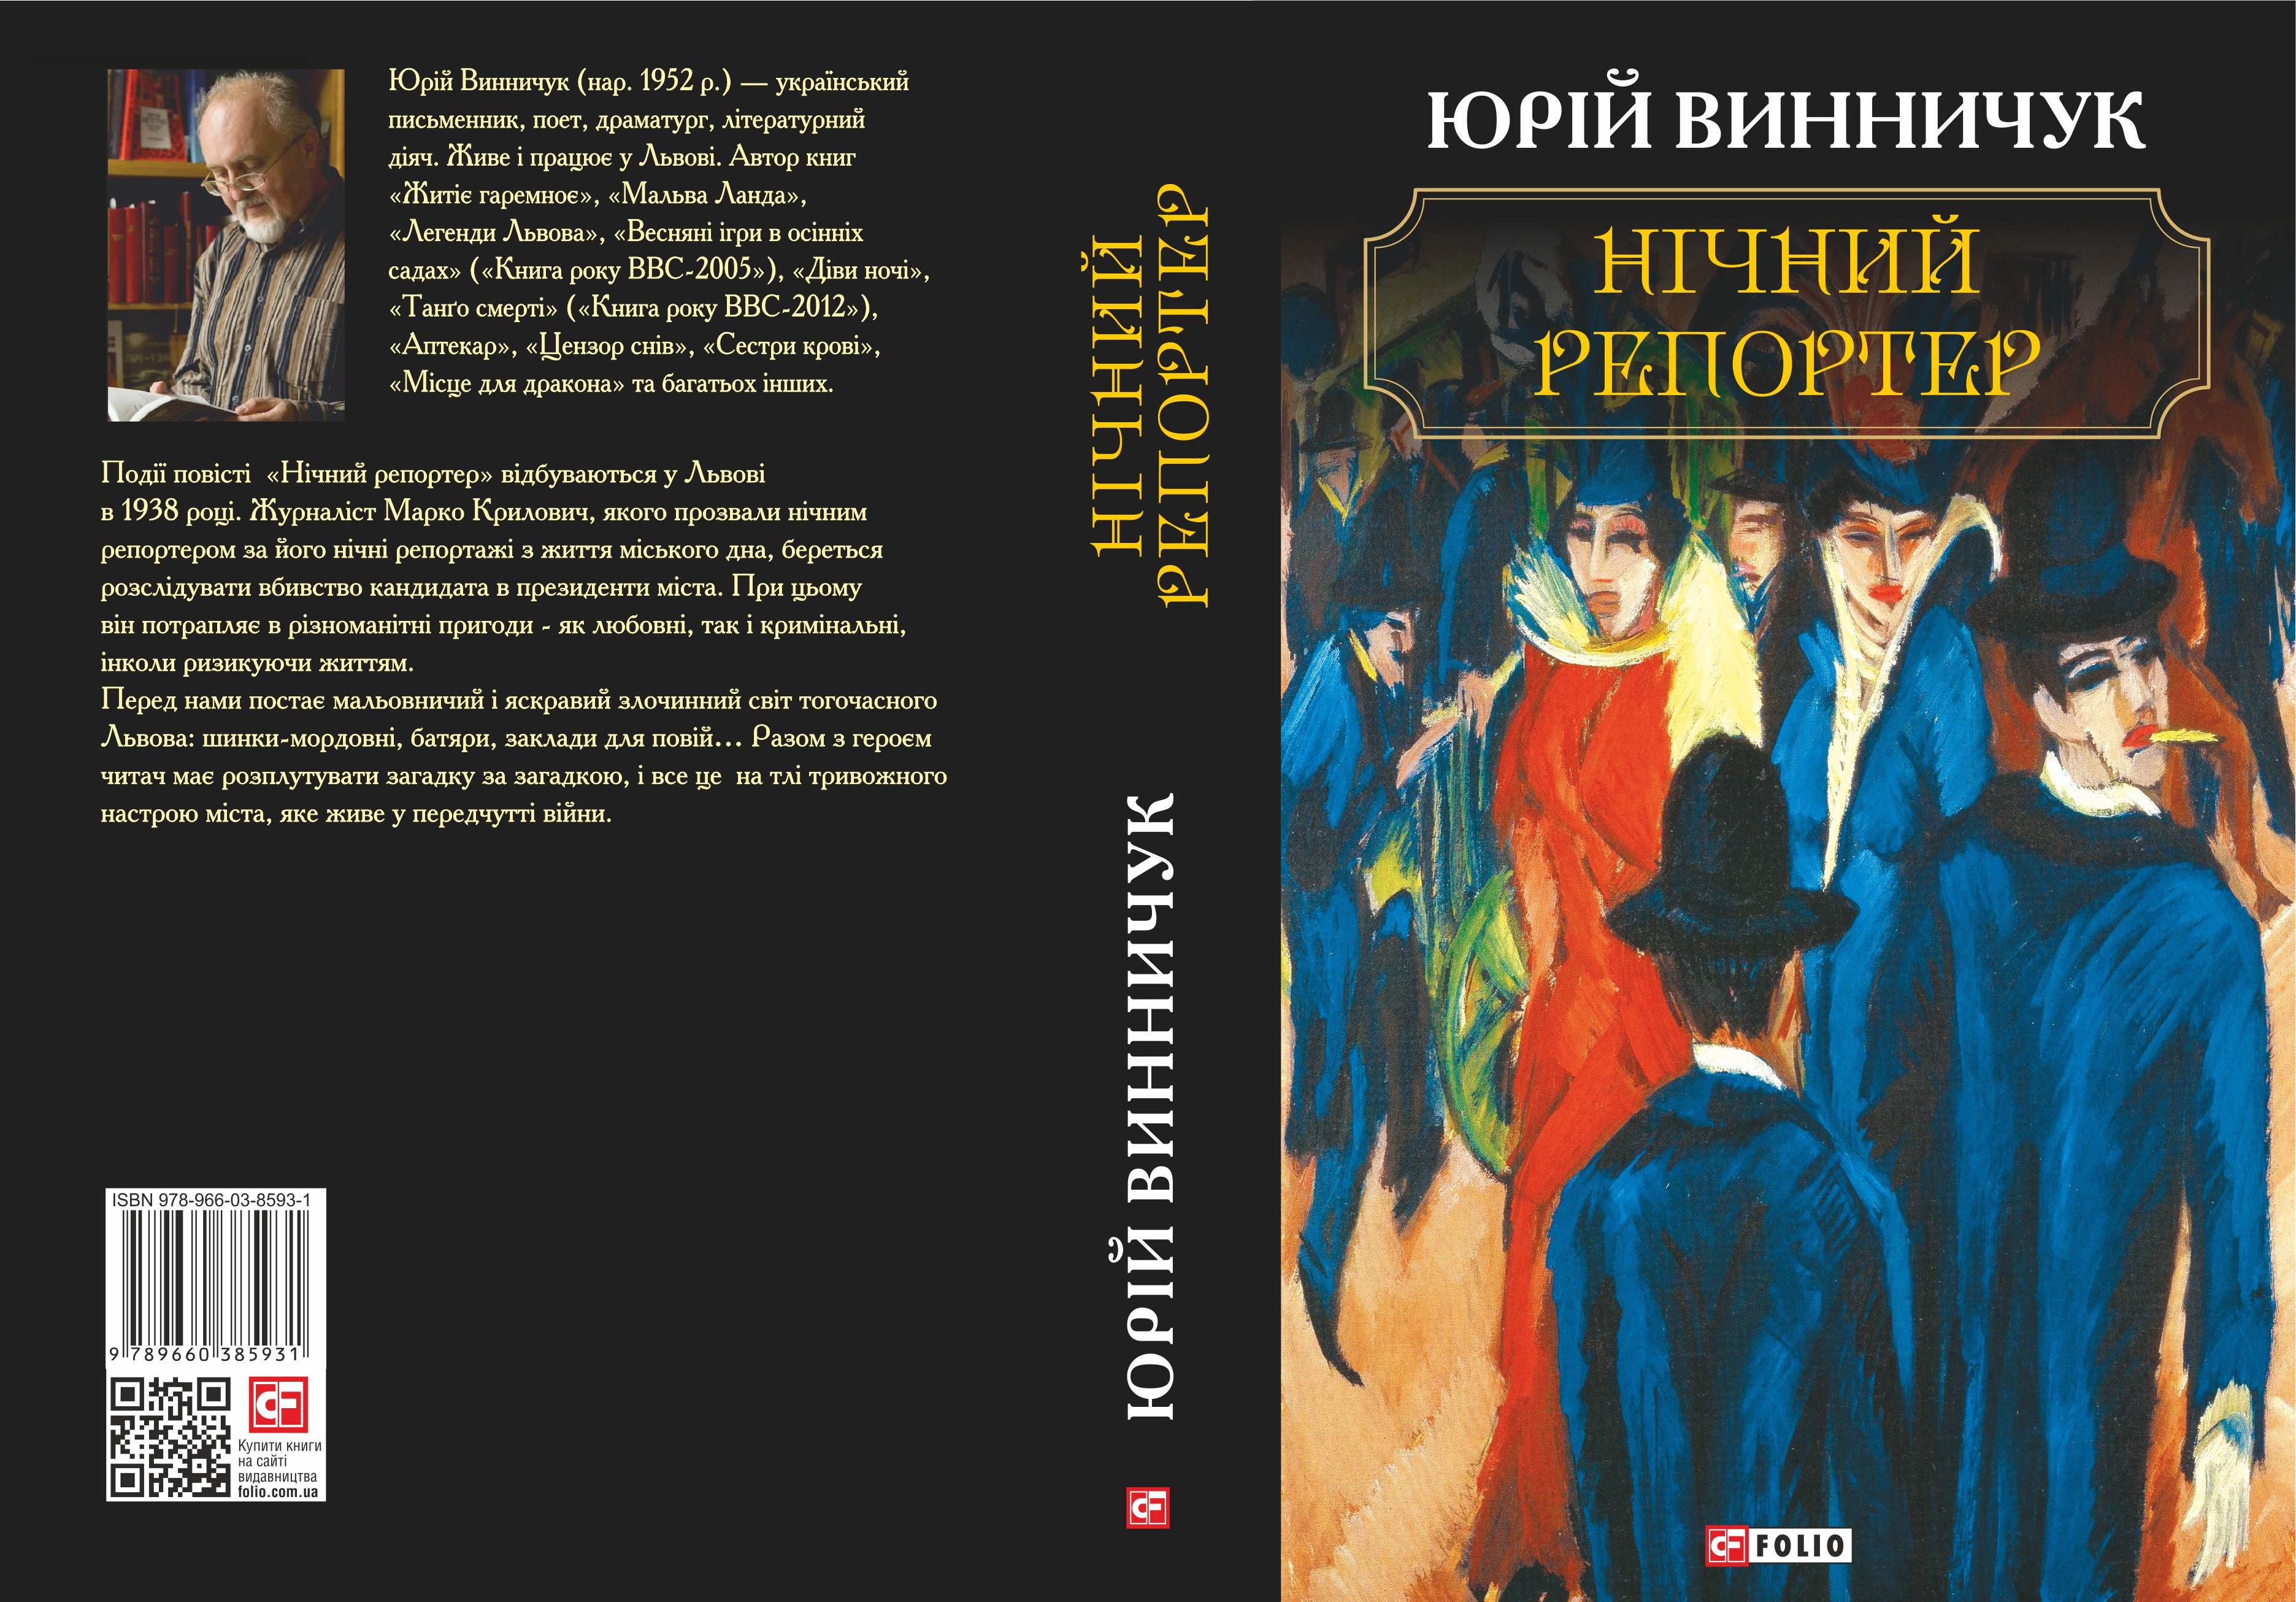 Юрий Винничук, Ночной репортер